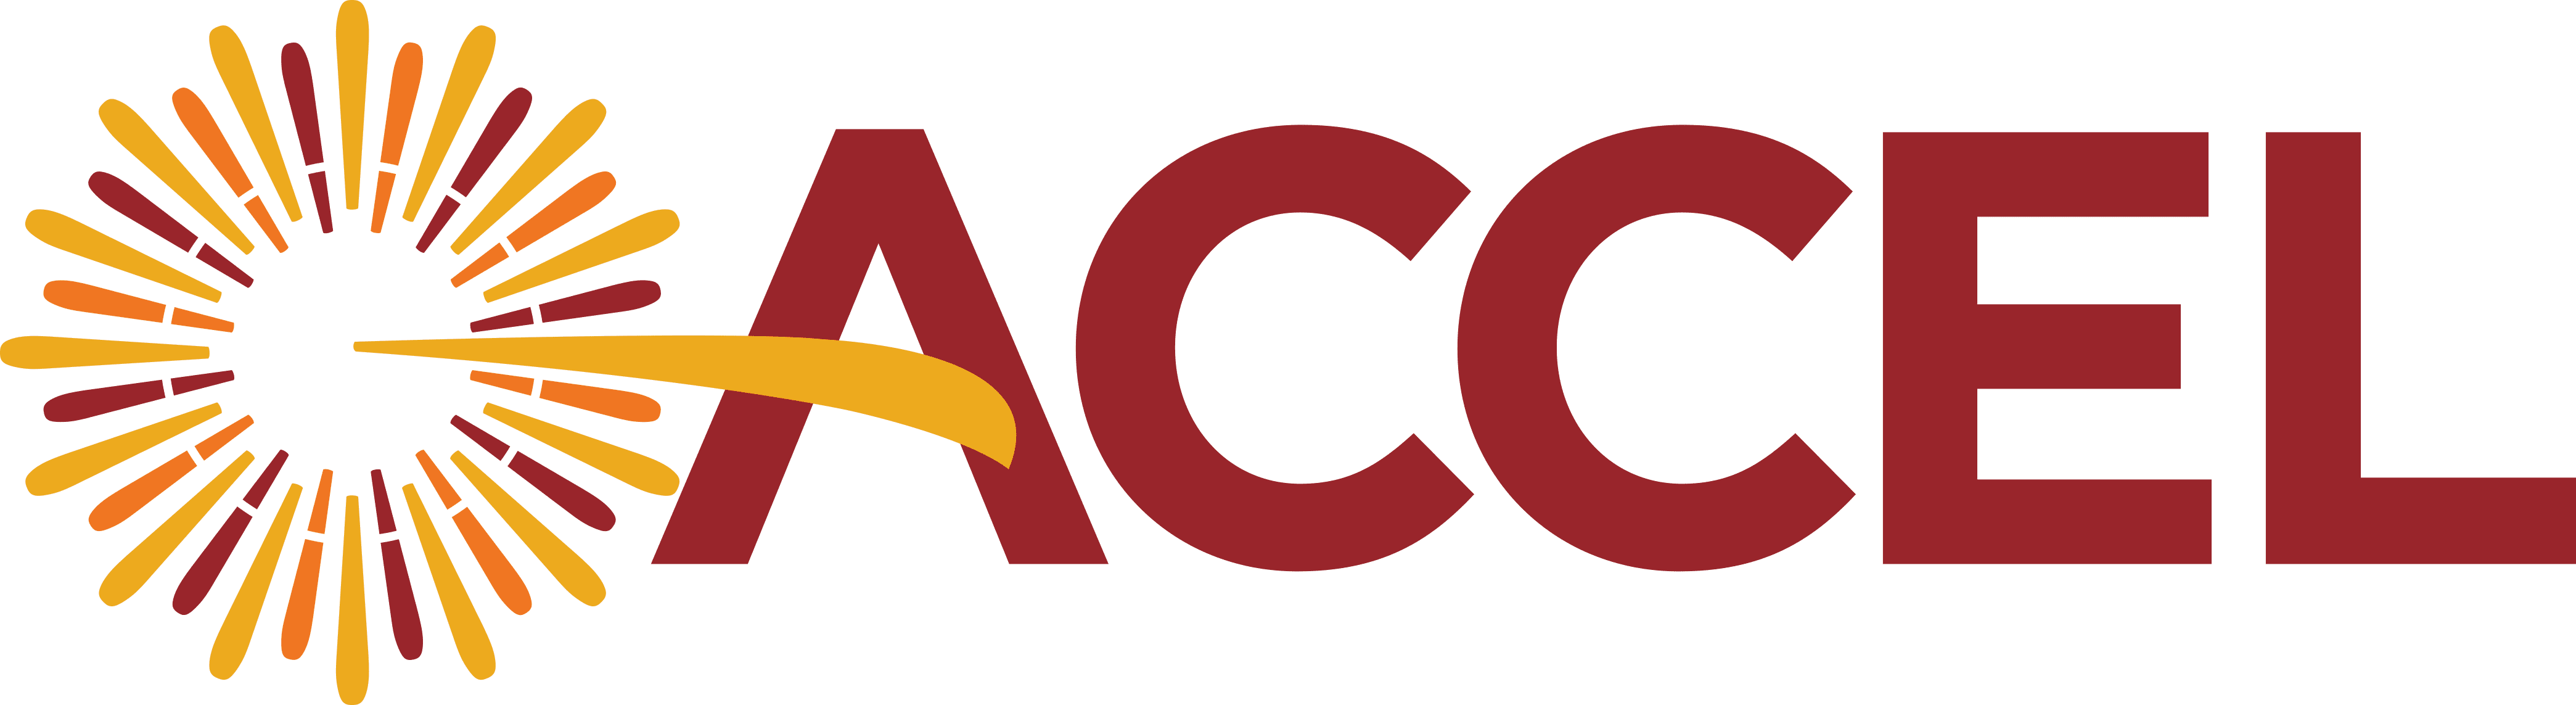 ACCEL Logo 2020